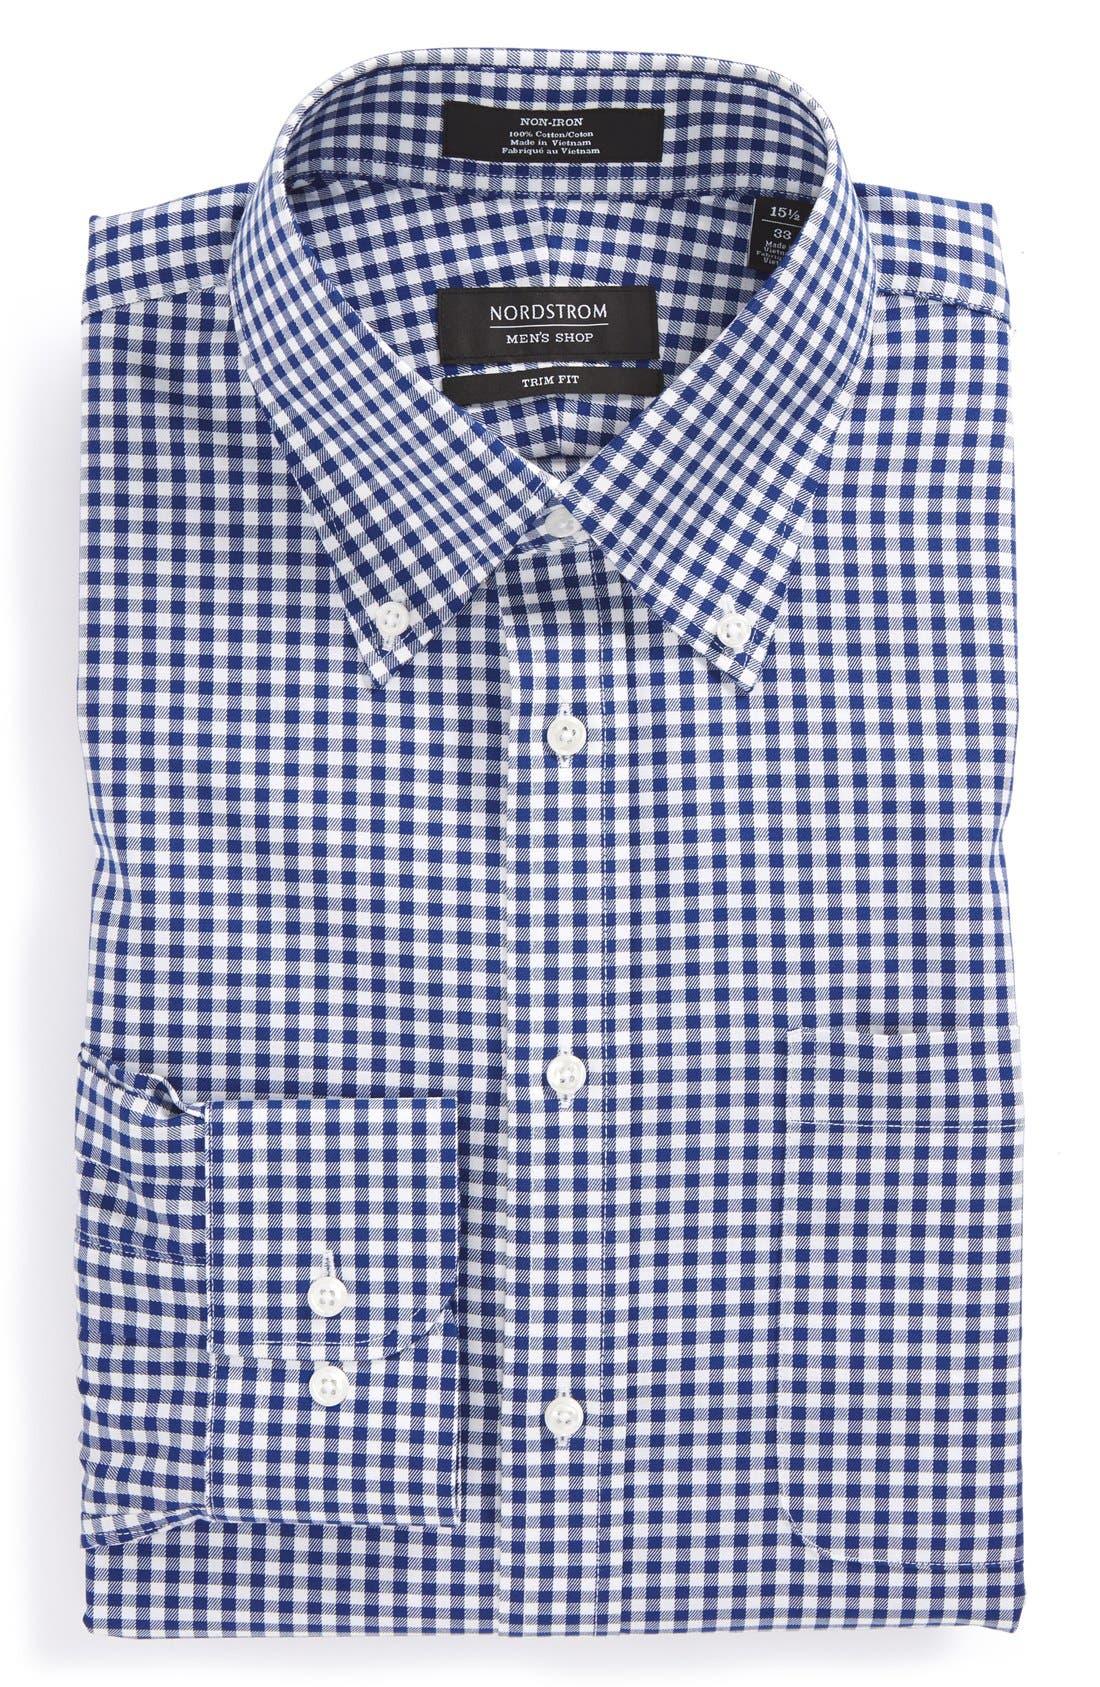 Nordstrom Men's Shop Trim Fit Non-Iron Gingham Dress Shirt